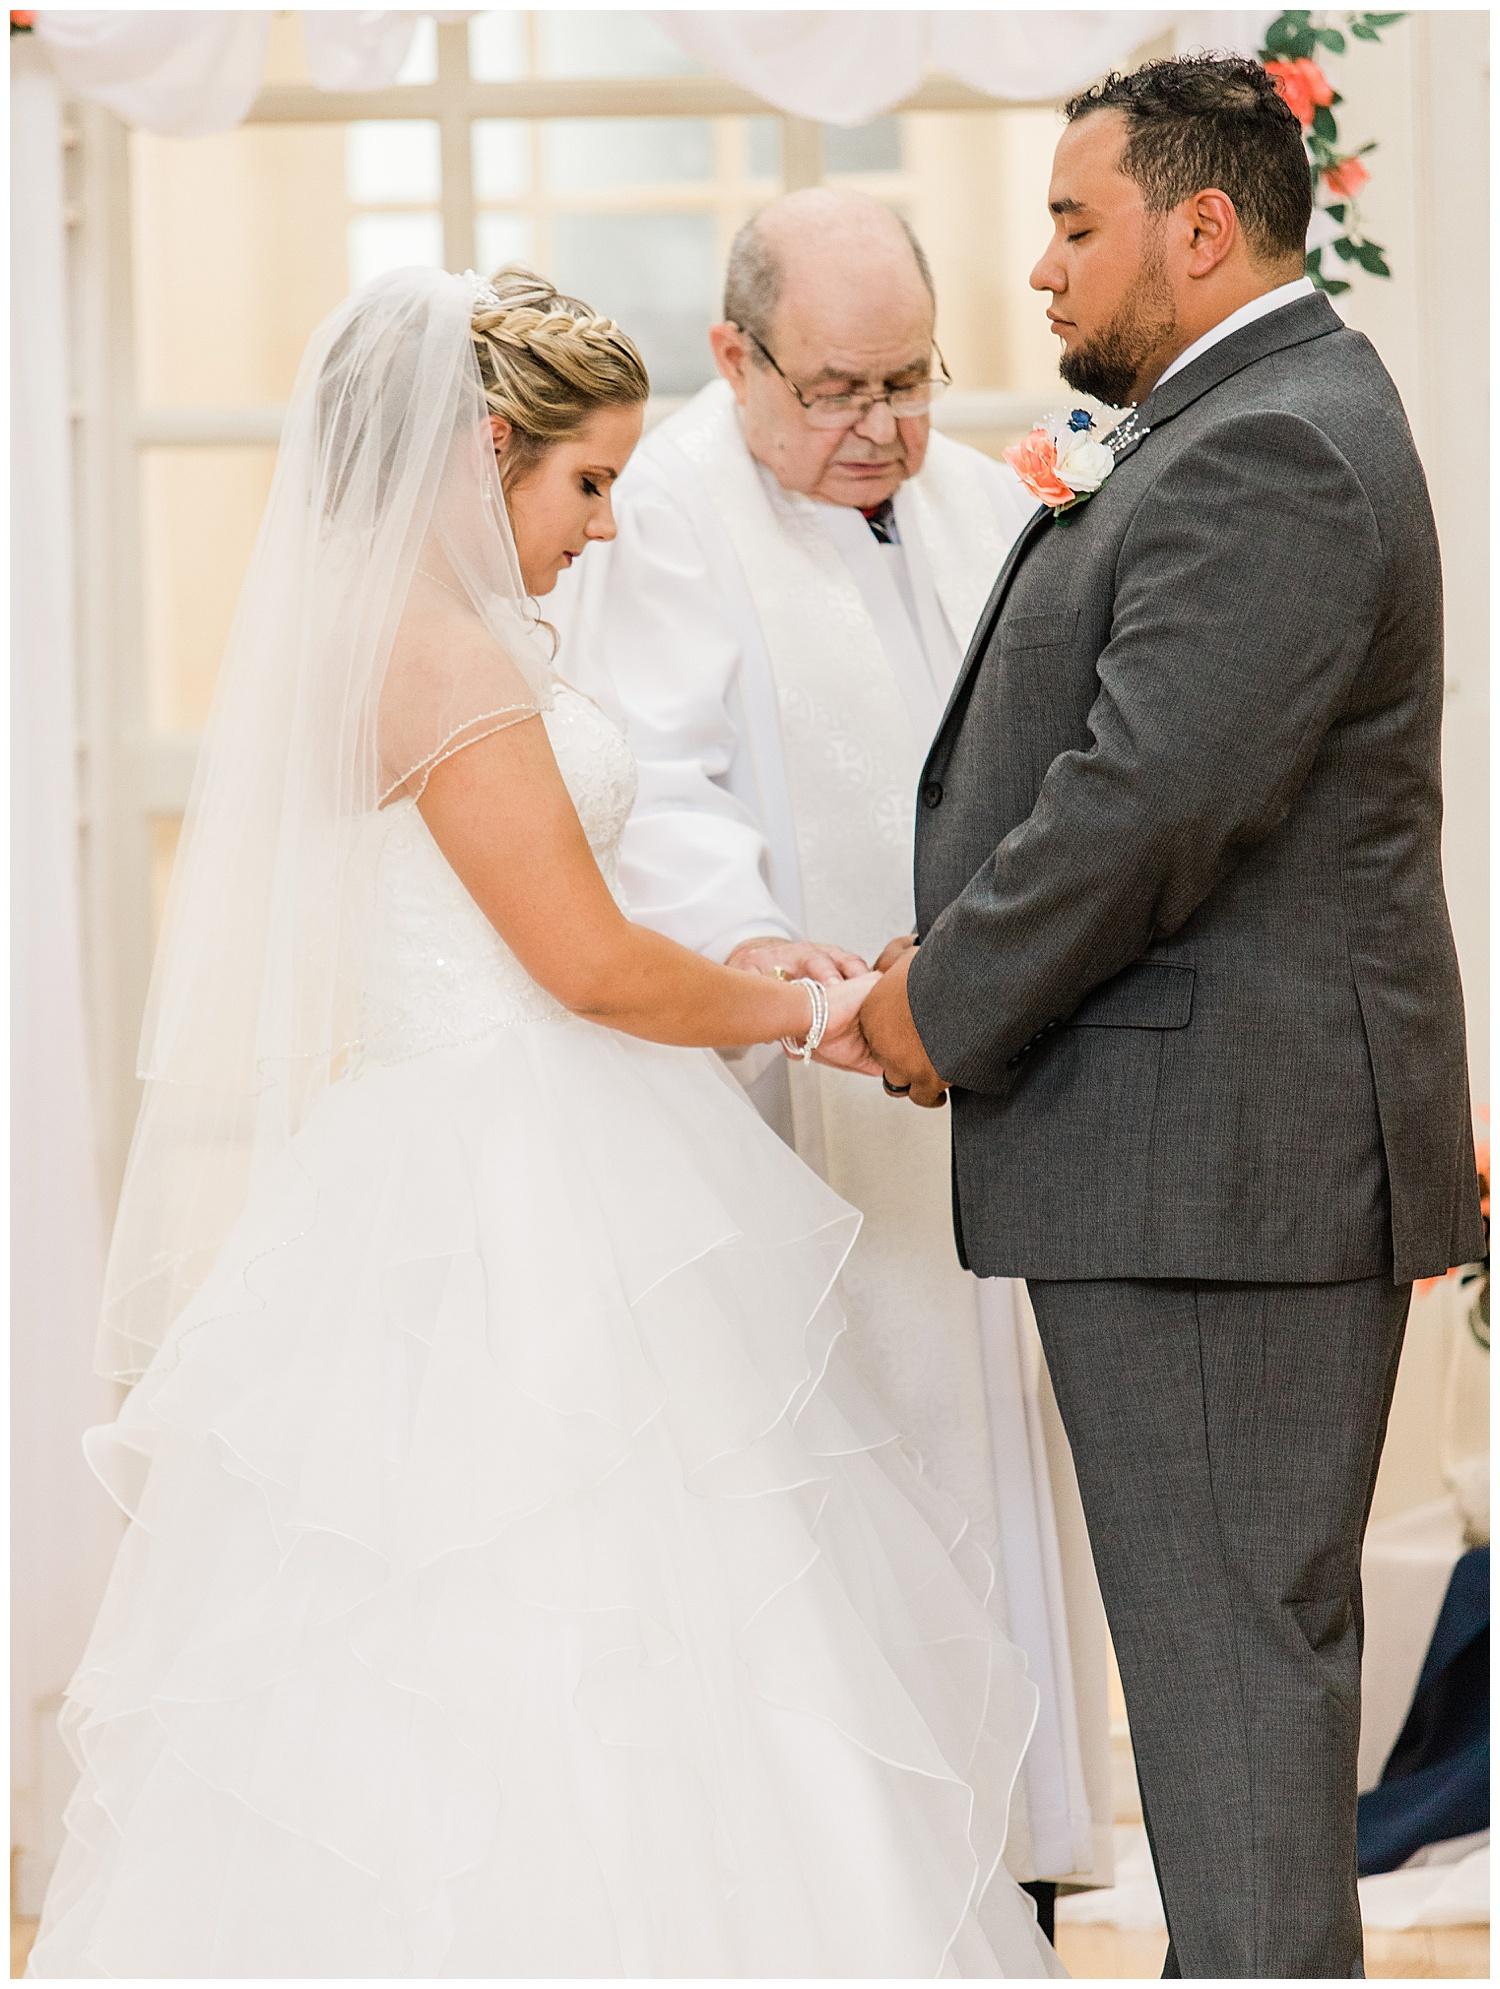 Wedding Ceremony - Bride + Groom - Virginia Wedding Photographer